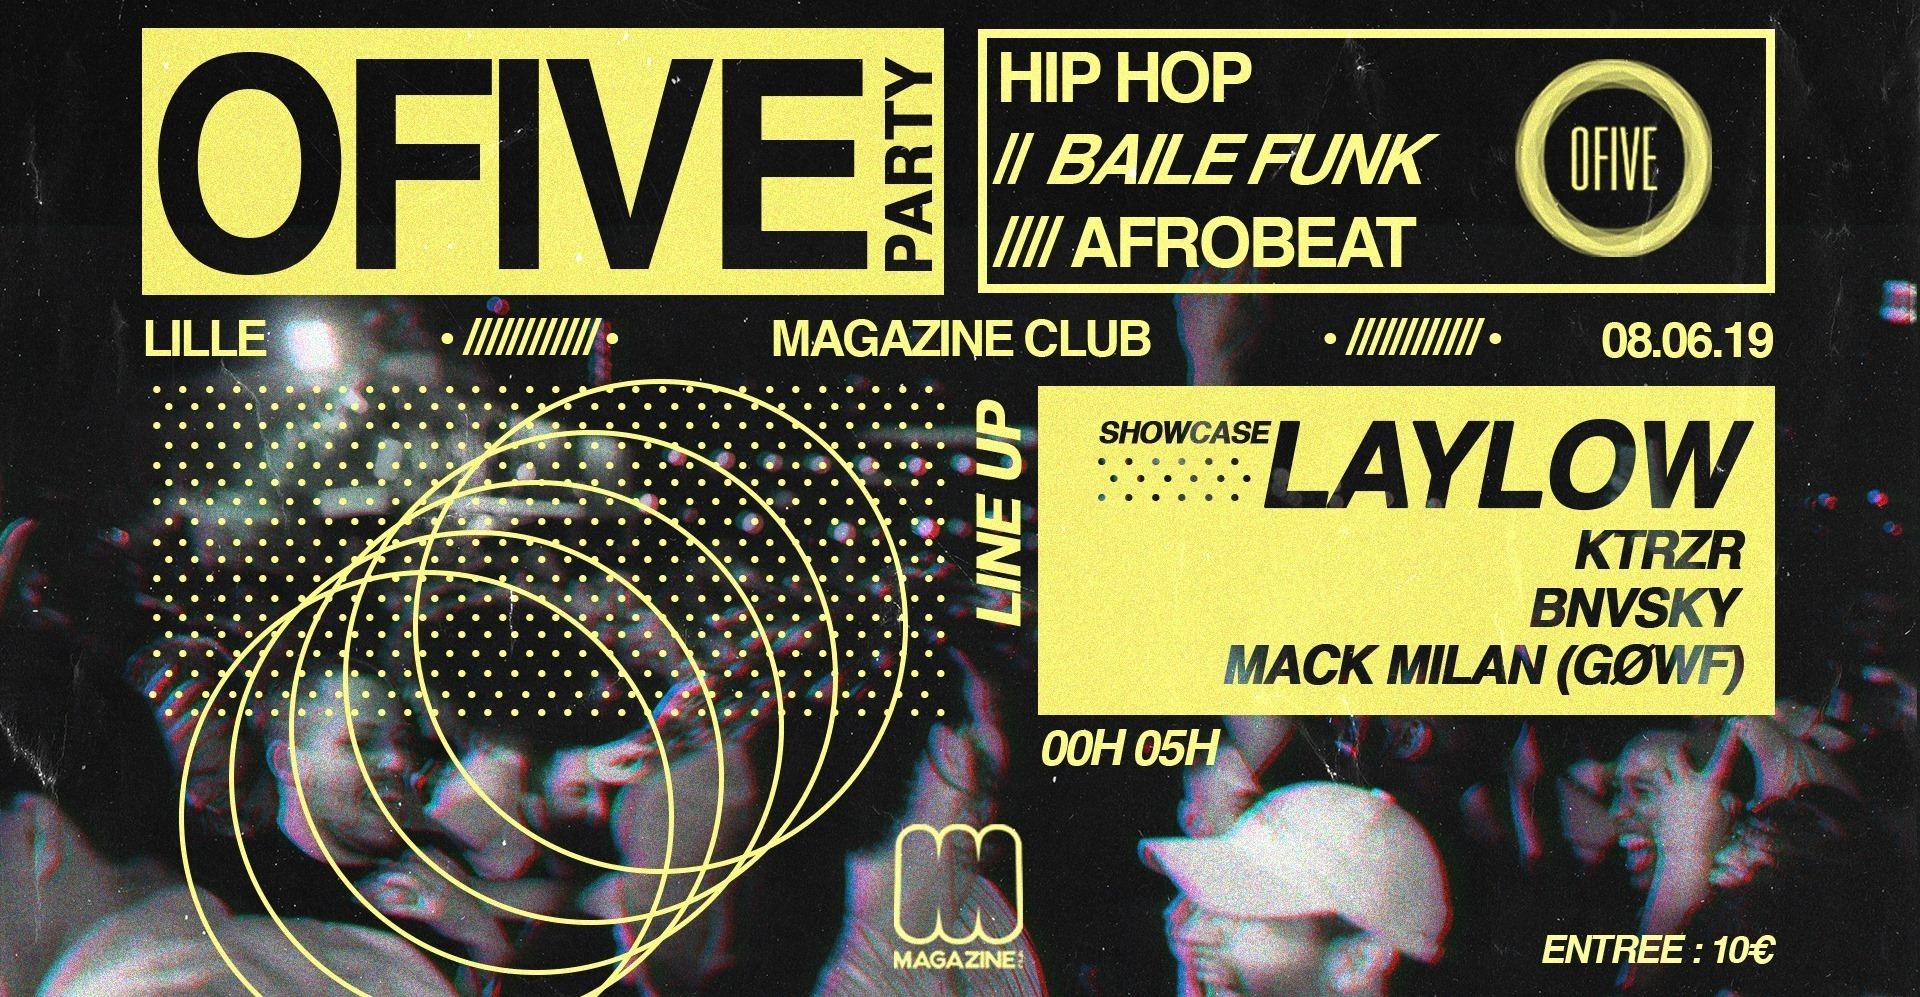 Ofive Party Lille x Magazine Club